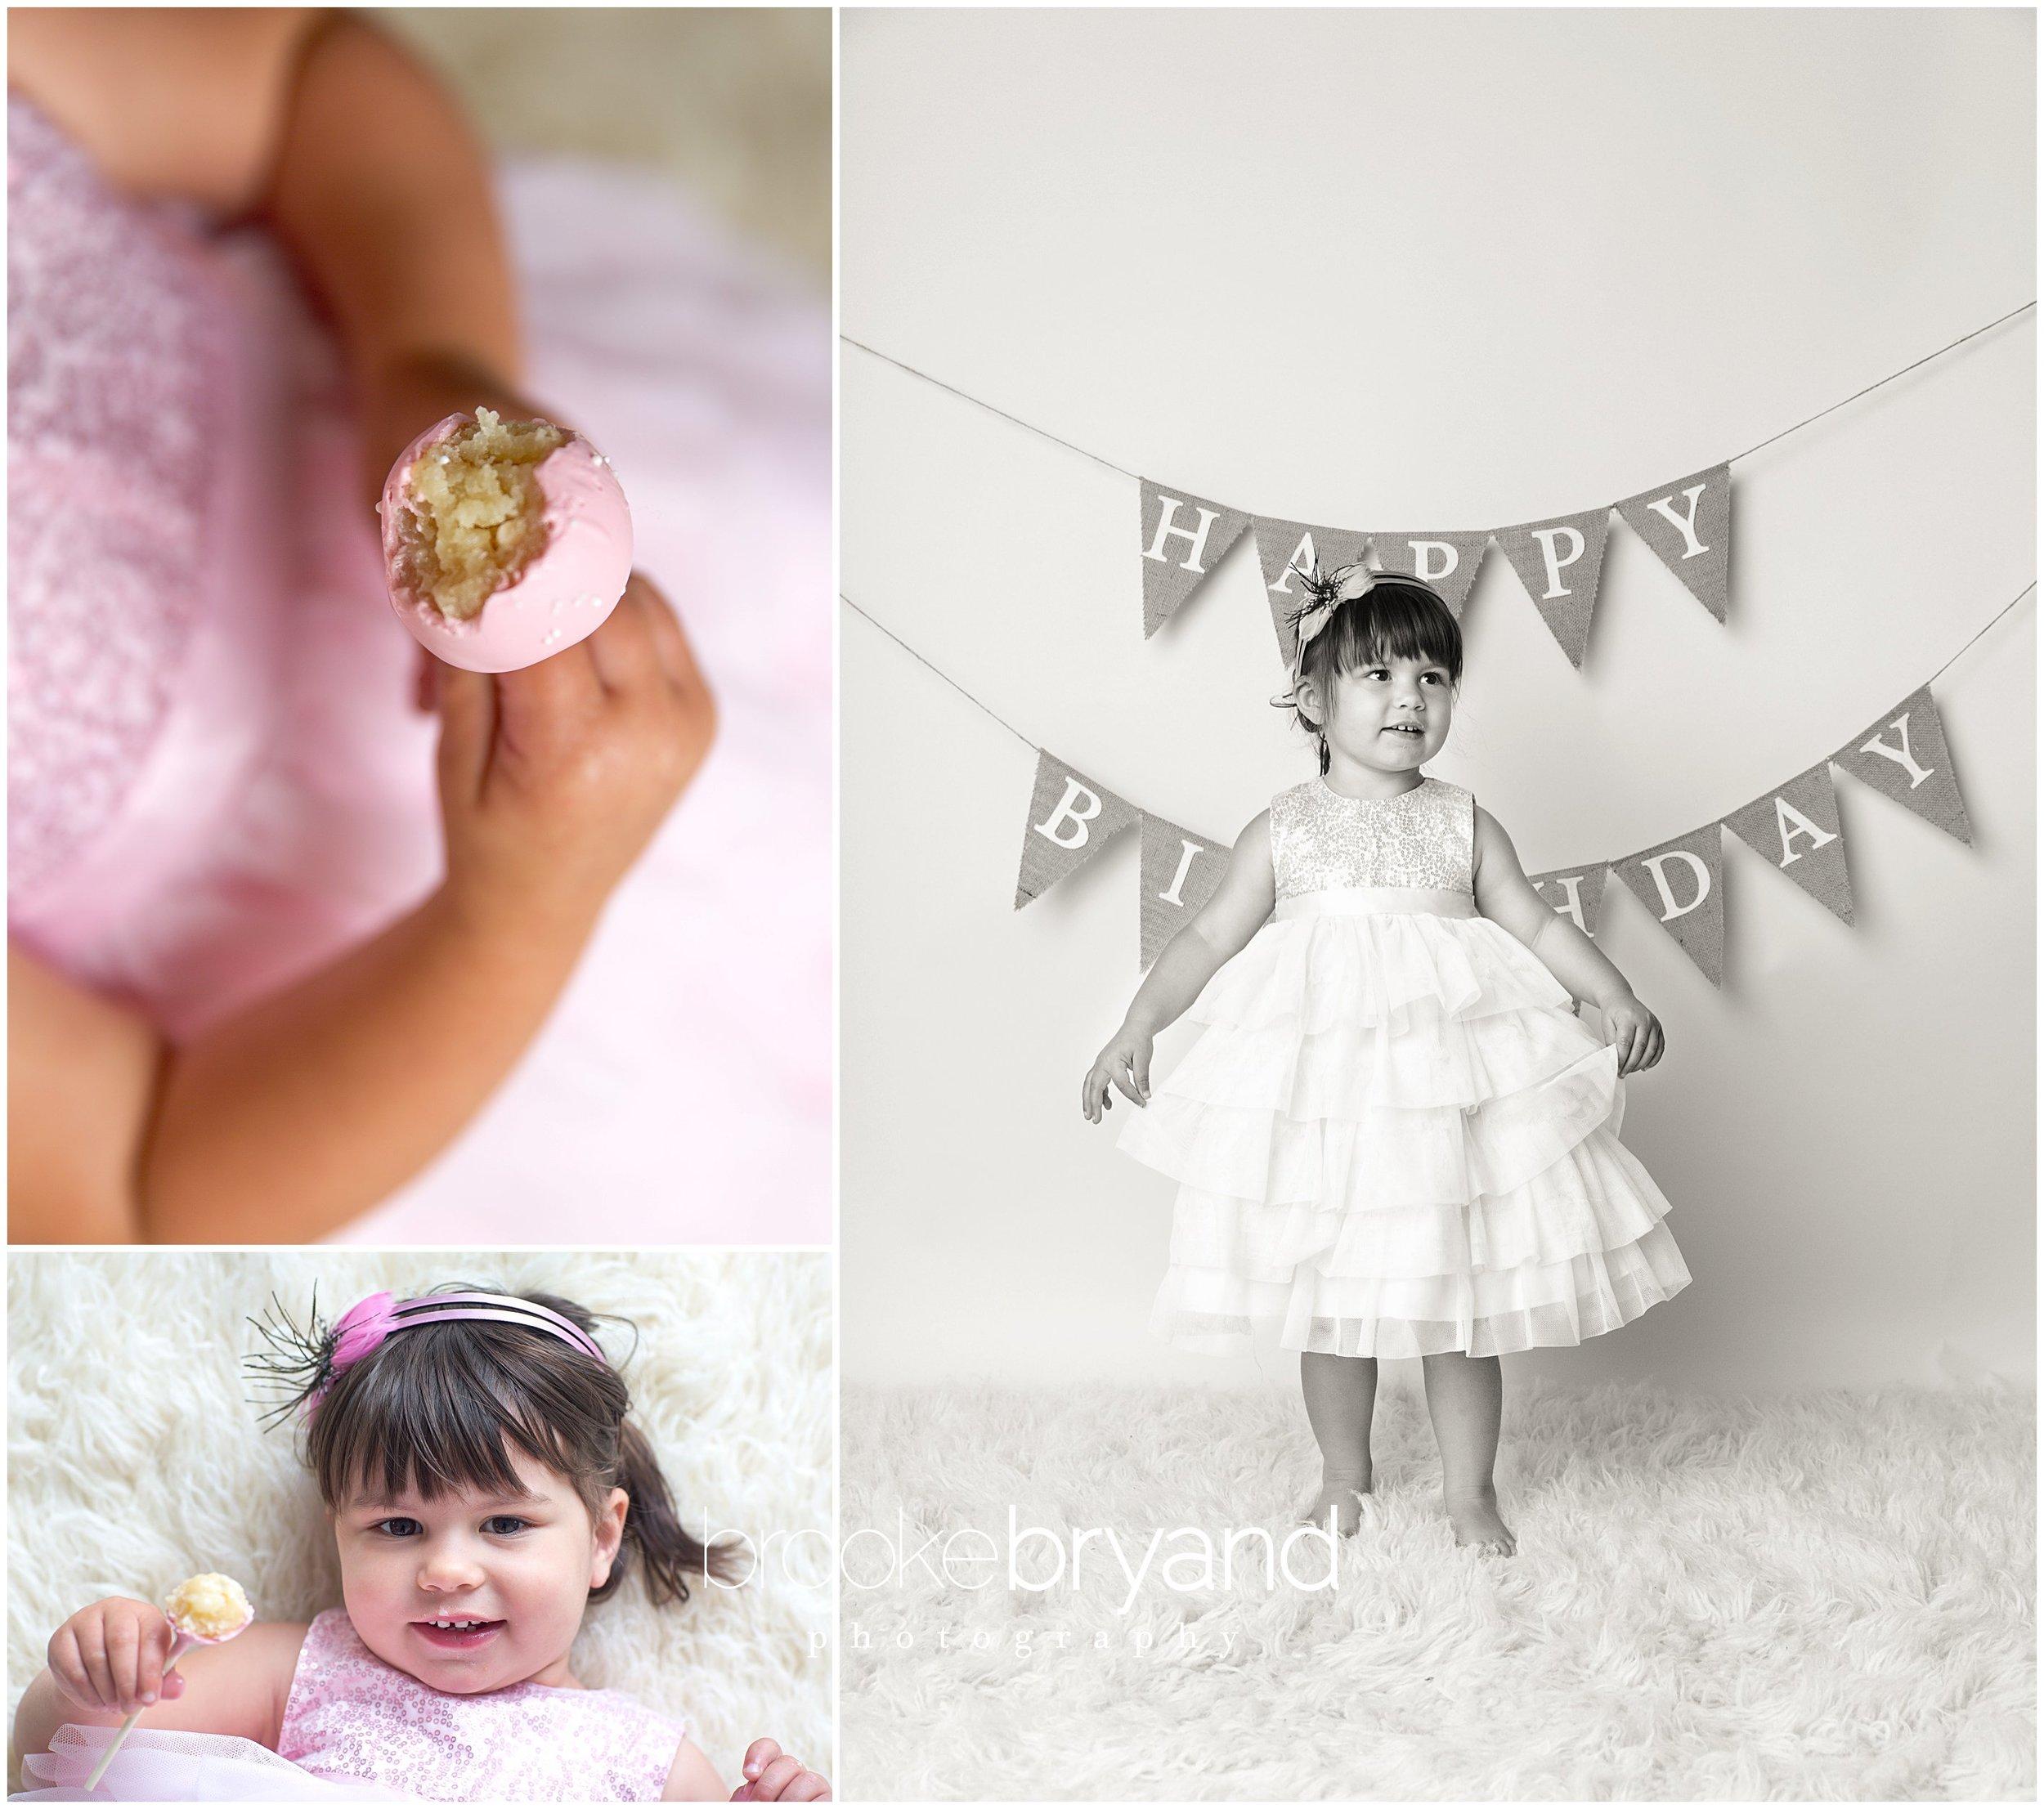 08.2014-Lily-Birthday-BBP_8060_San-Francisco-Family-Photos-Brooke-Bryand-Photography.jpg